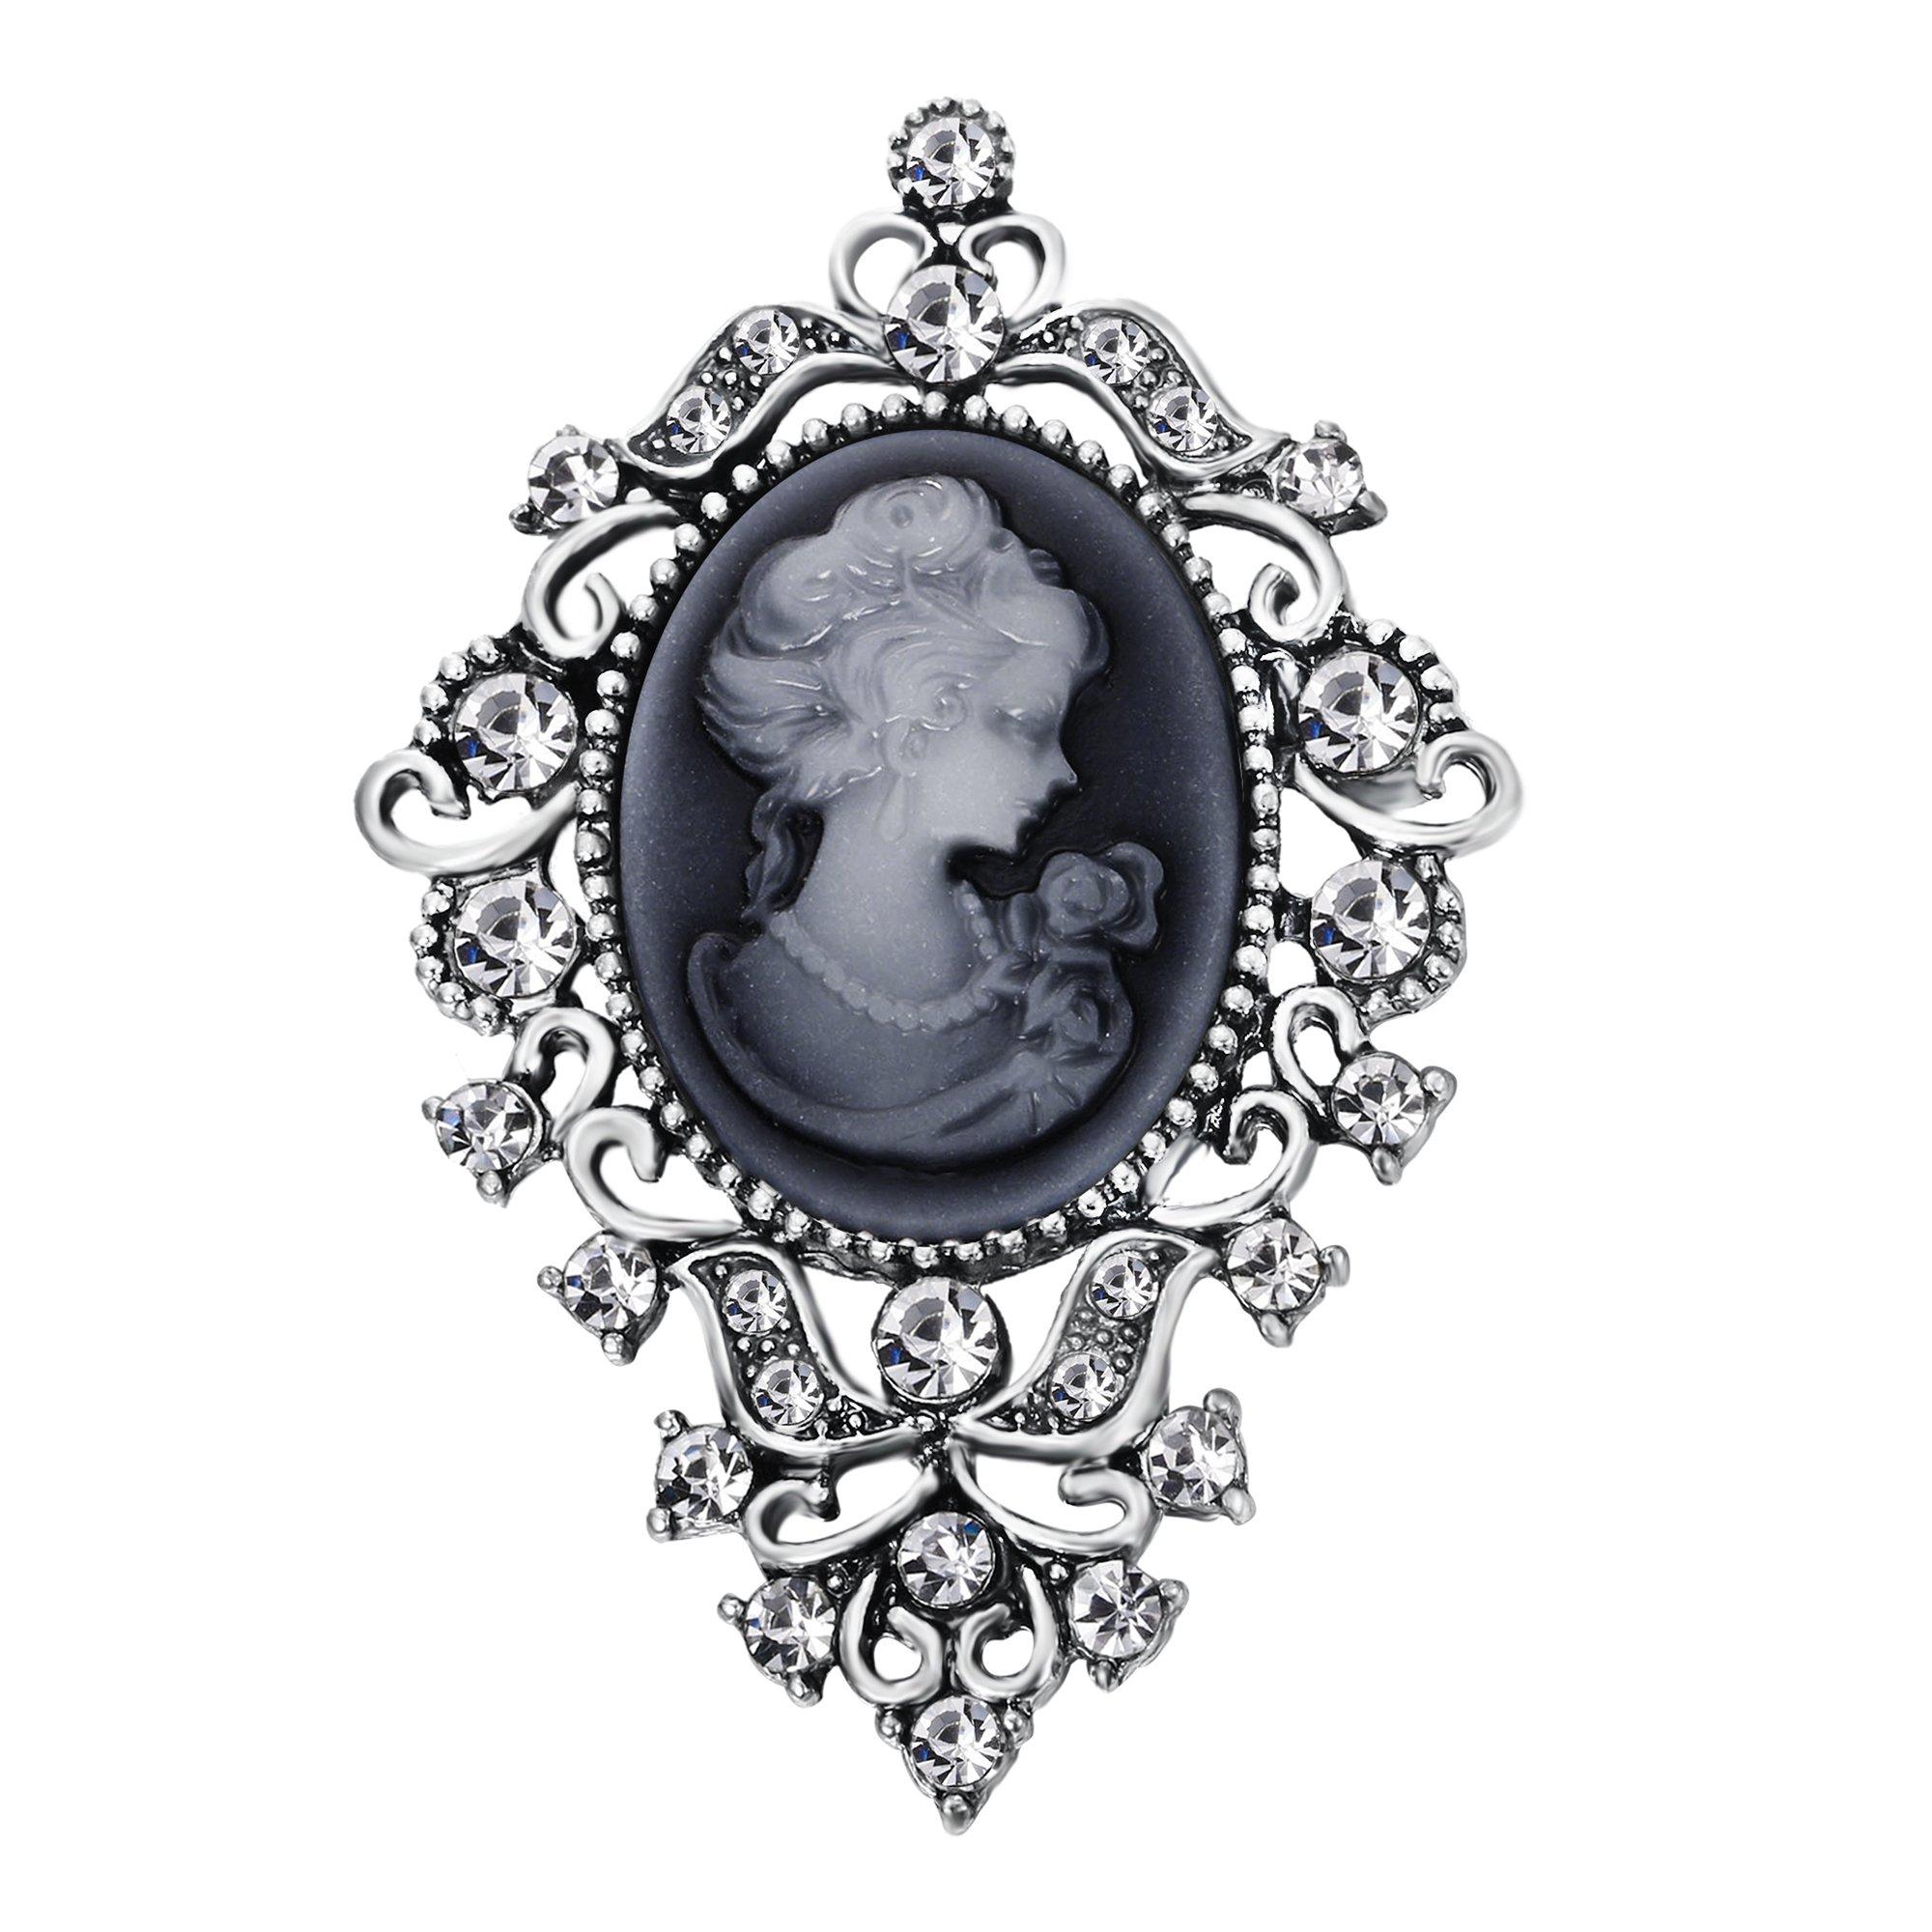 BriLove Women's Wedding Bridal Crystal Victorian Lady Cameo Brooch Pin Grey Black Antique-Silver-Tone